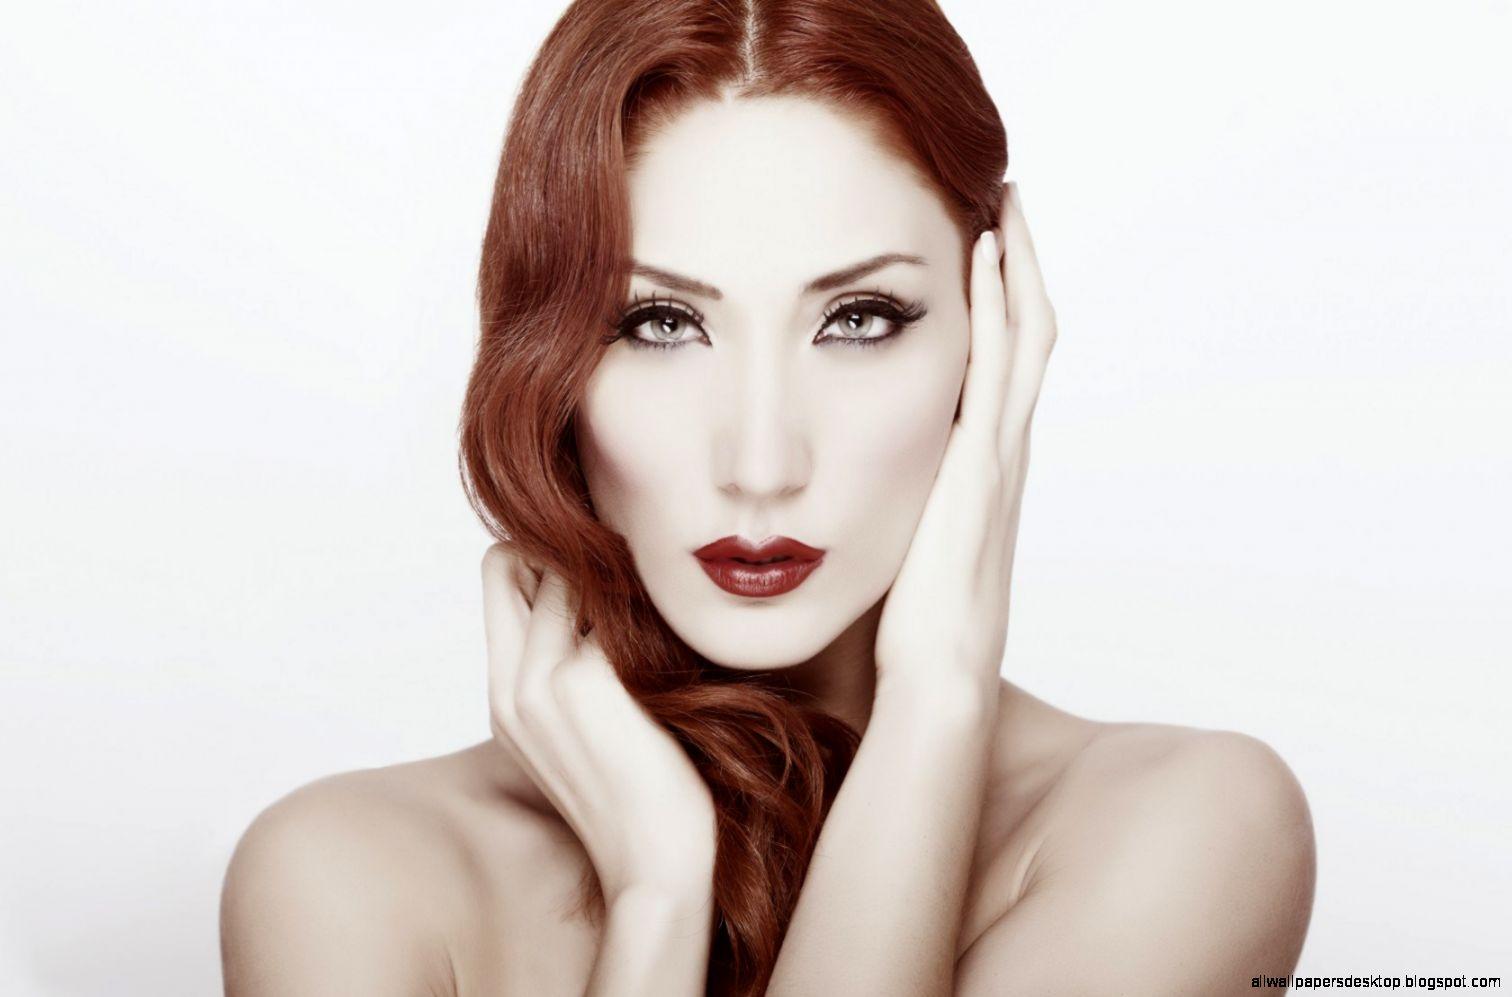 Lovely Girl Redhead Makeup wallpaper  1680x1050  20248